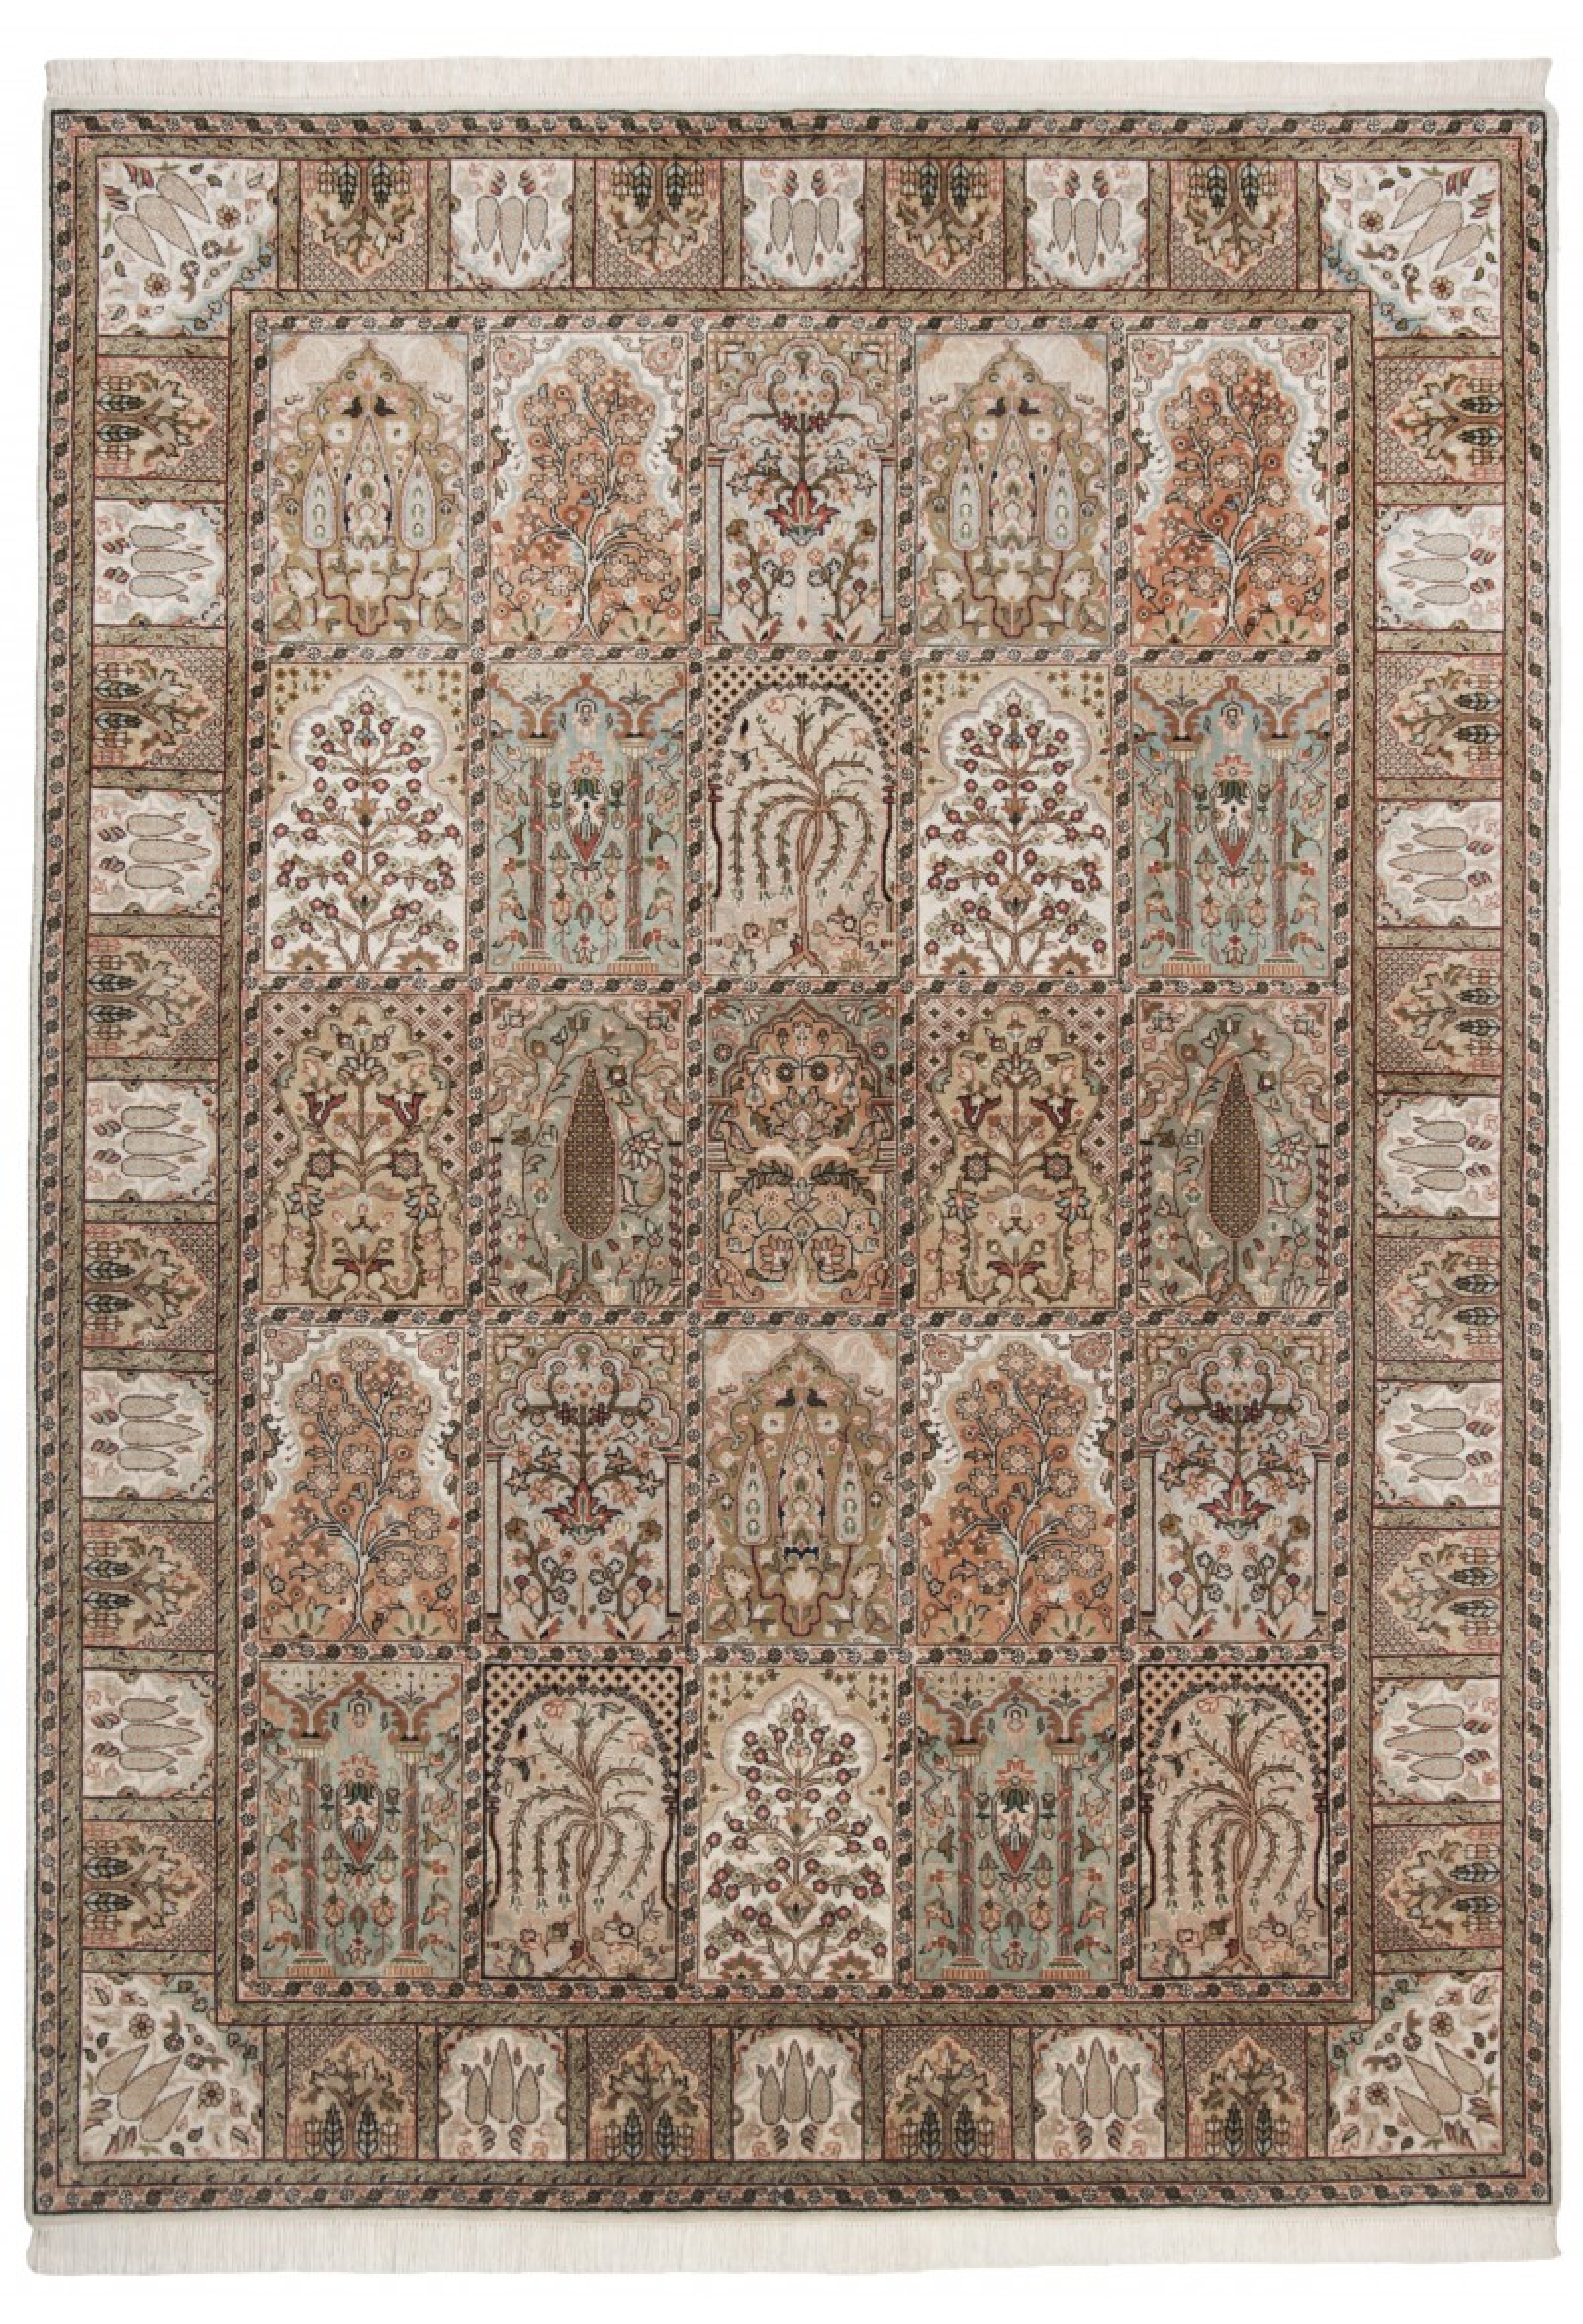 Teppich Sirsa Silk touch Bakhtiyari K (Creme; 200 x 300 cm)